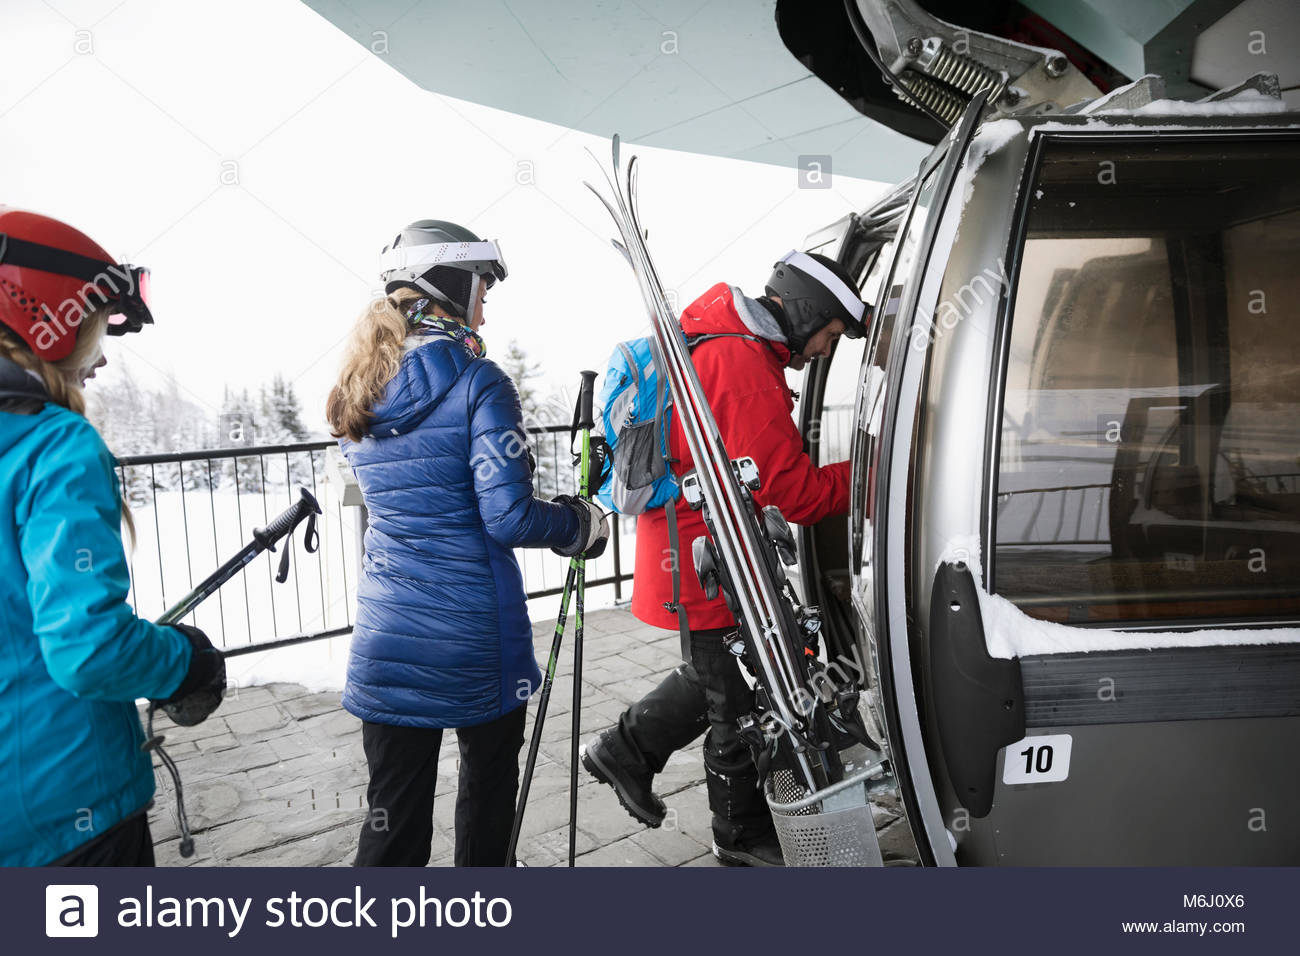 Family skiers getting into gondola at ski resort - Stock Image